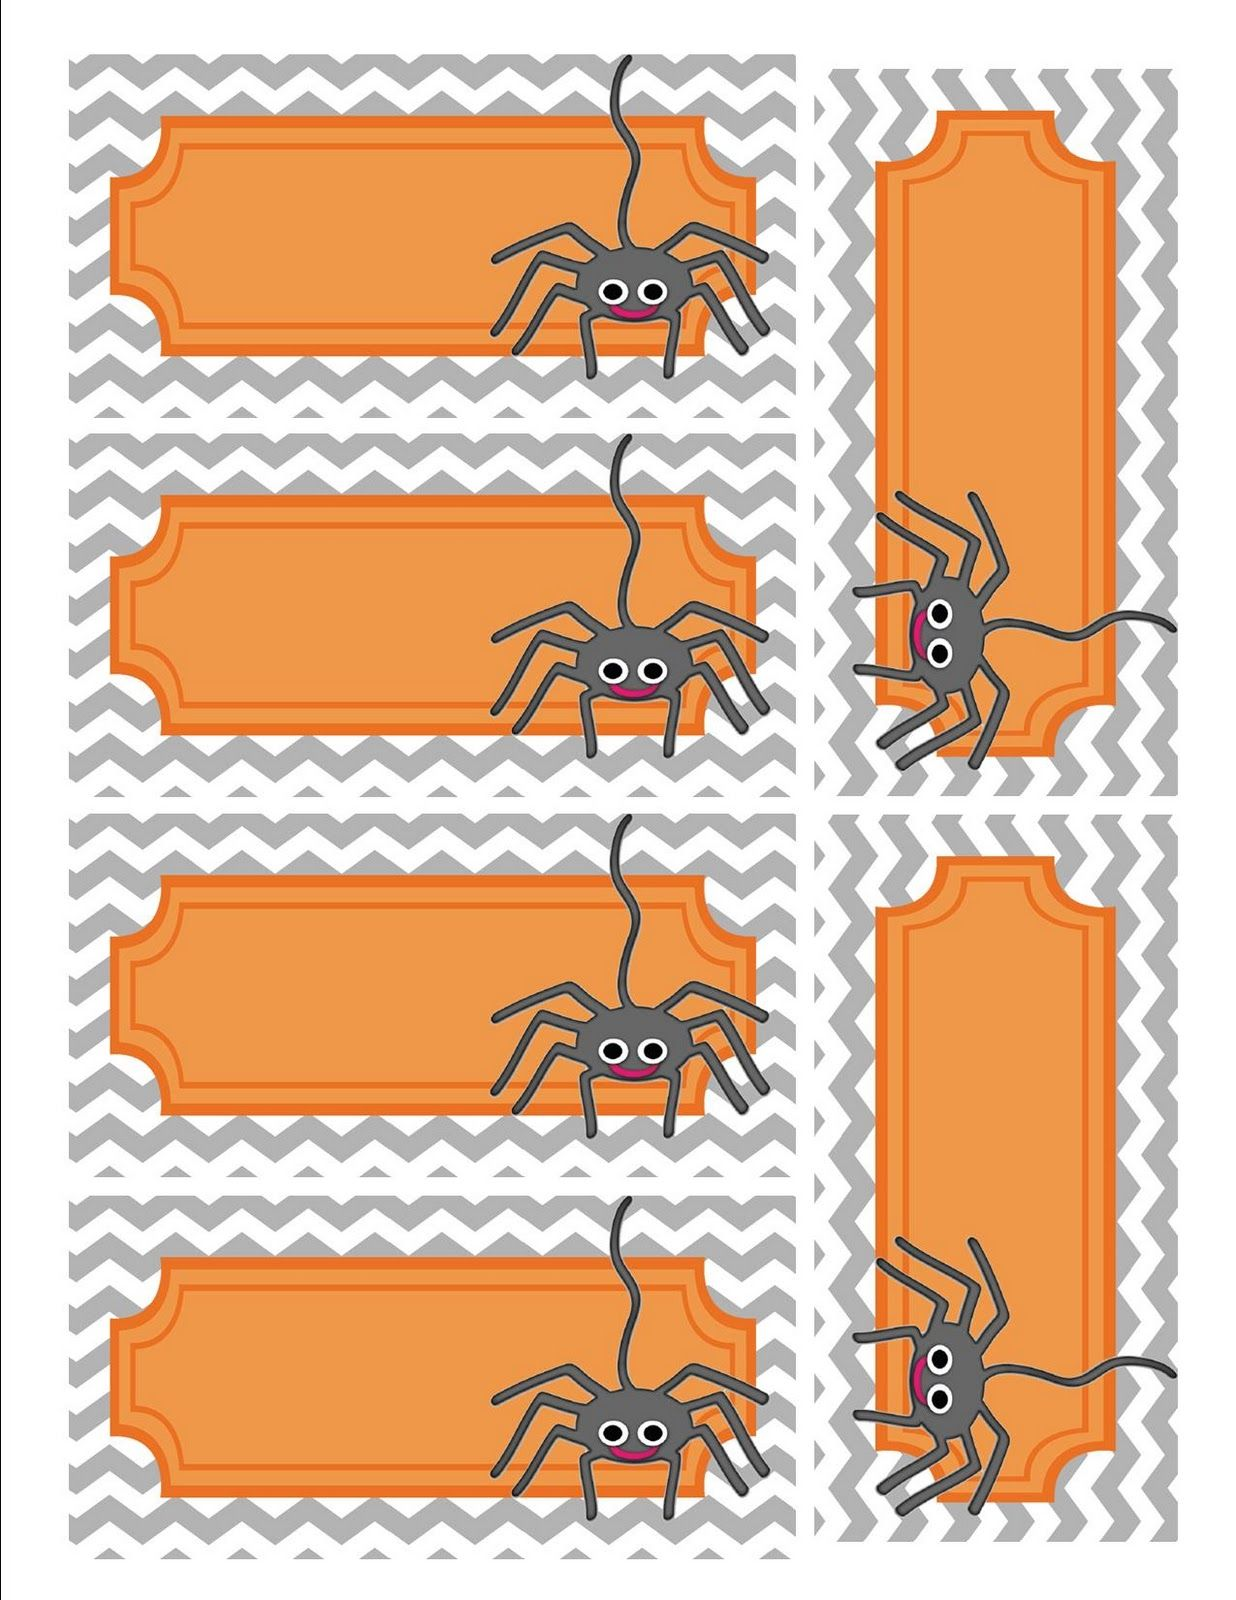 printable halloween tags for goodie bags